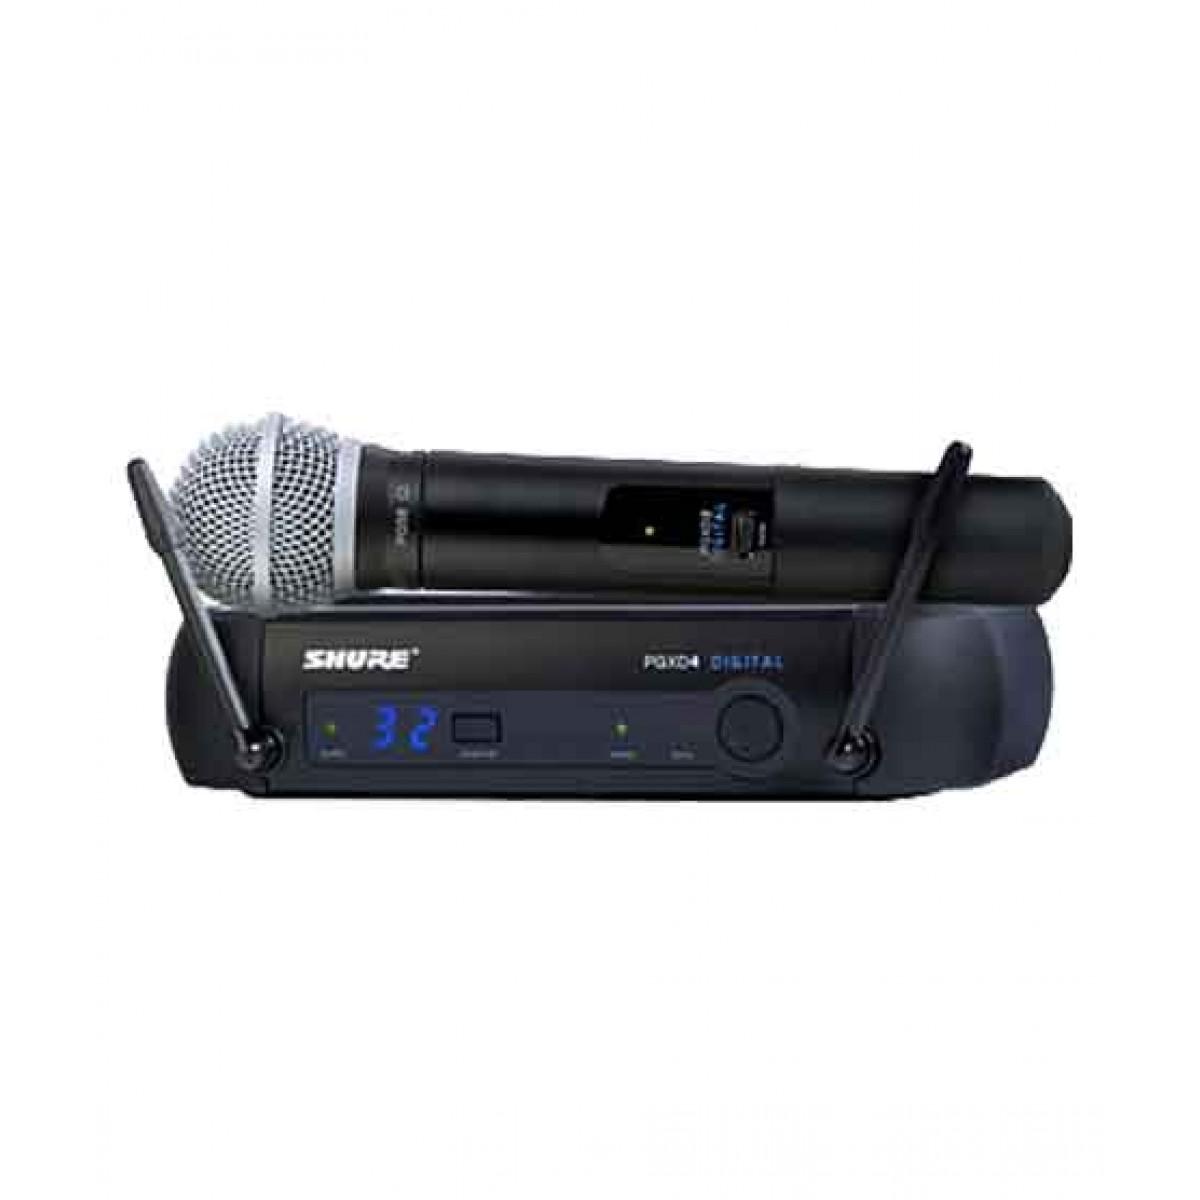 Shure Handheld Wireless System (PGXD24/PG58)